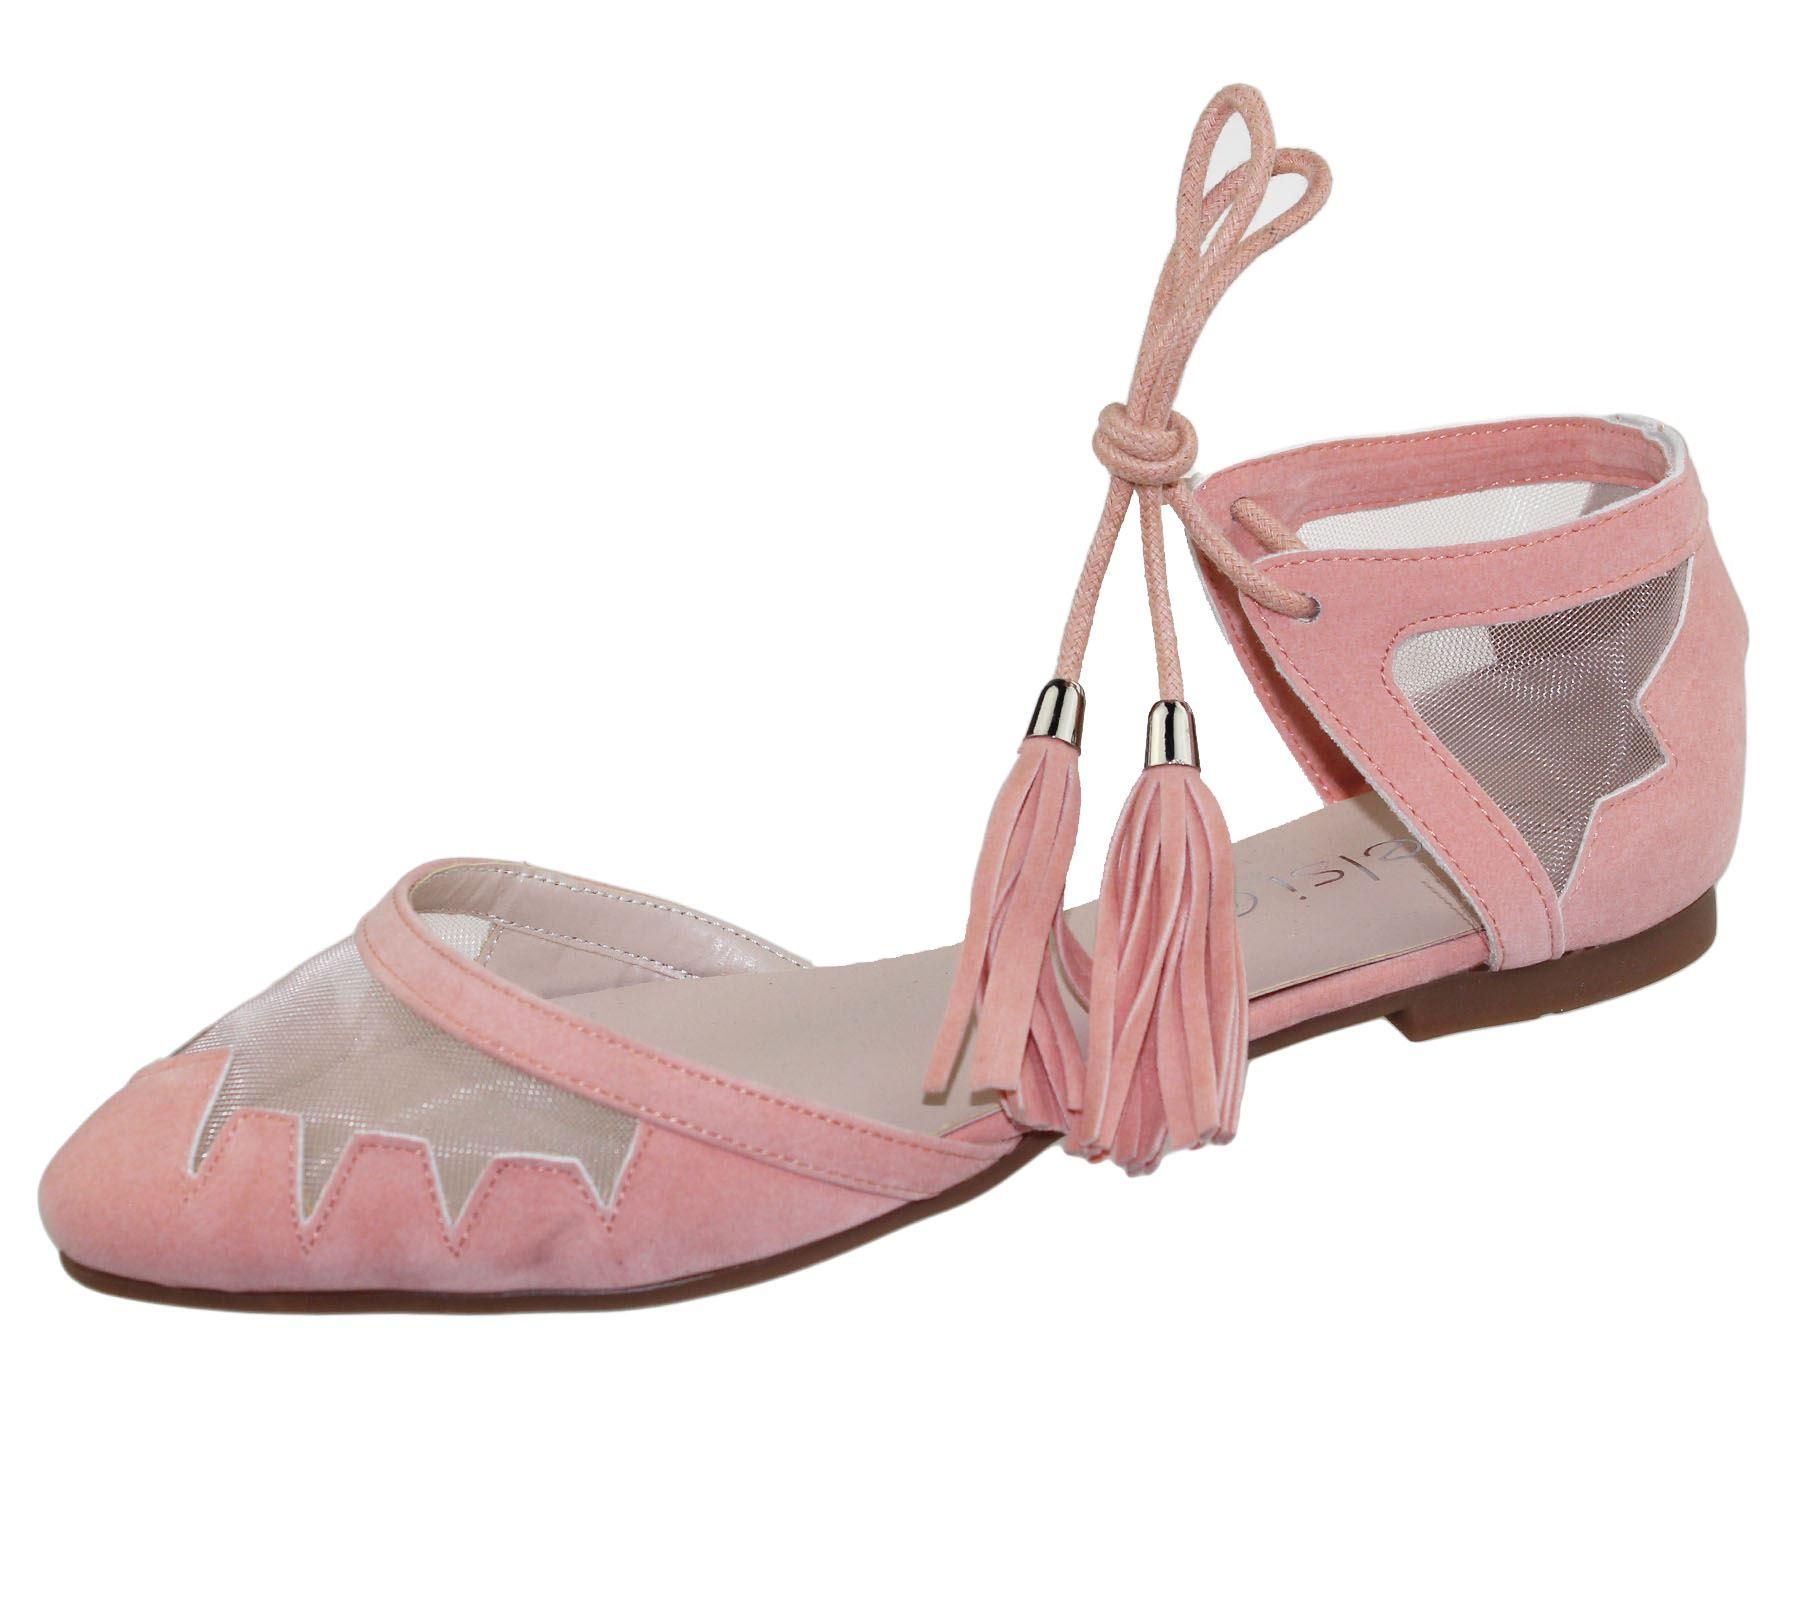 Womens-Flat-Ballerina-Dolly-Pumps-Ballet-Ladies-Summer-Mesh-Tassel-Shoes-Sandals thumbnail 33